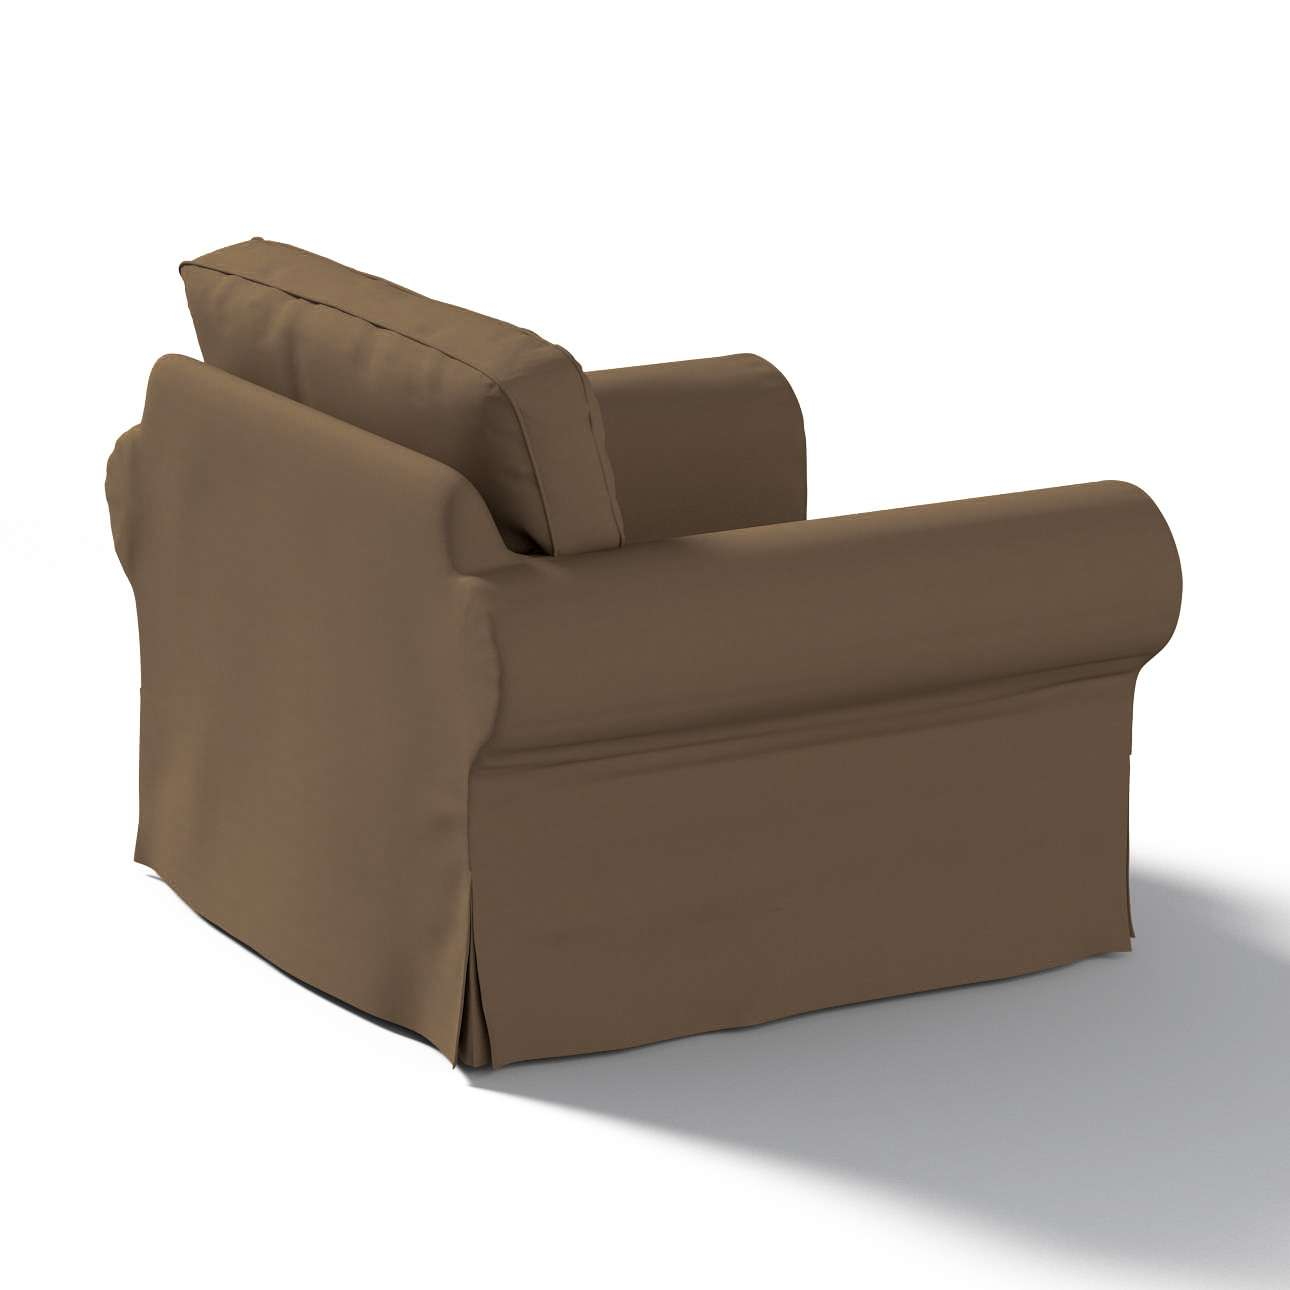 Ektorp Sesselbezug Sesselhusse, Ektorp Sessel von der Kollektion Cotton Panama, Stoff: 702-02